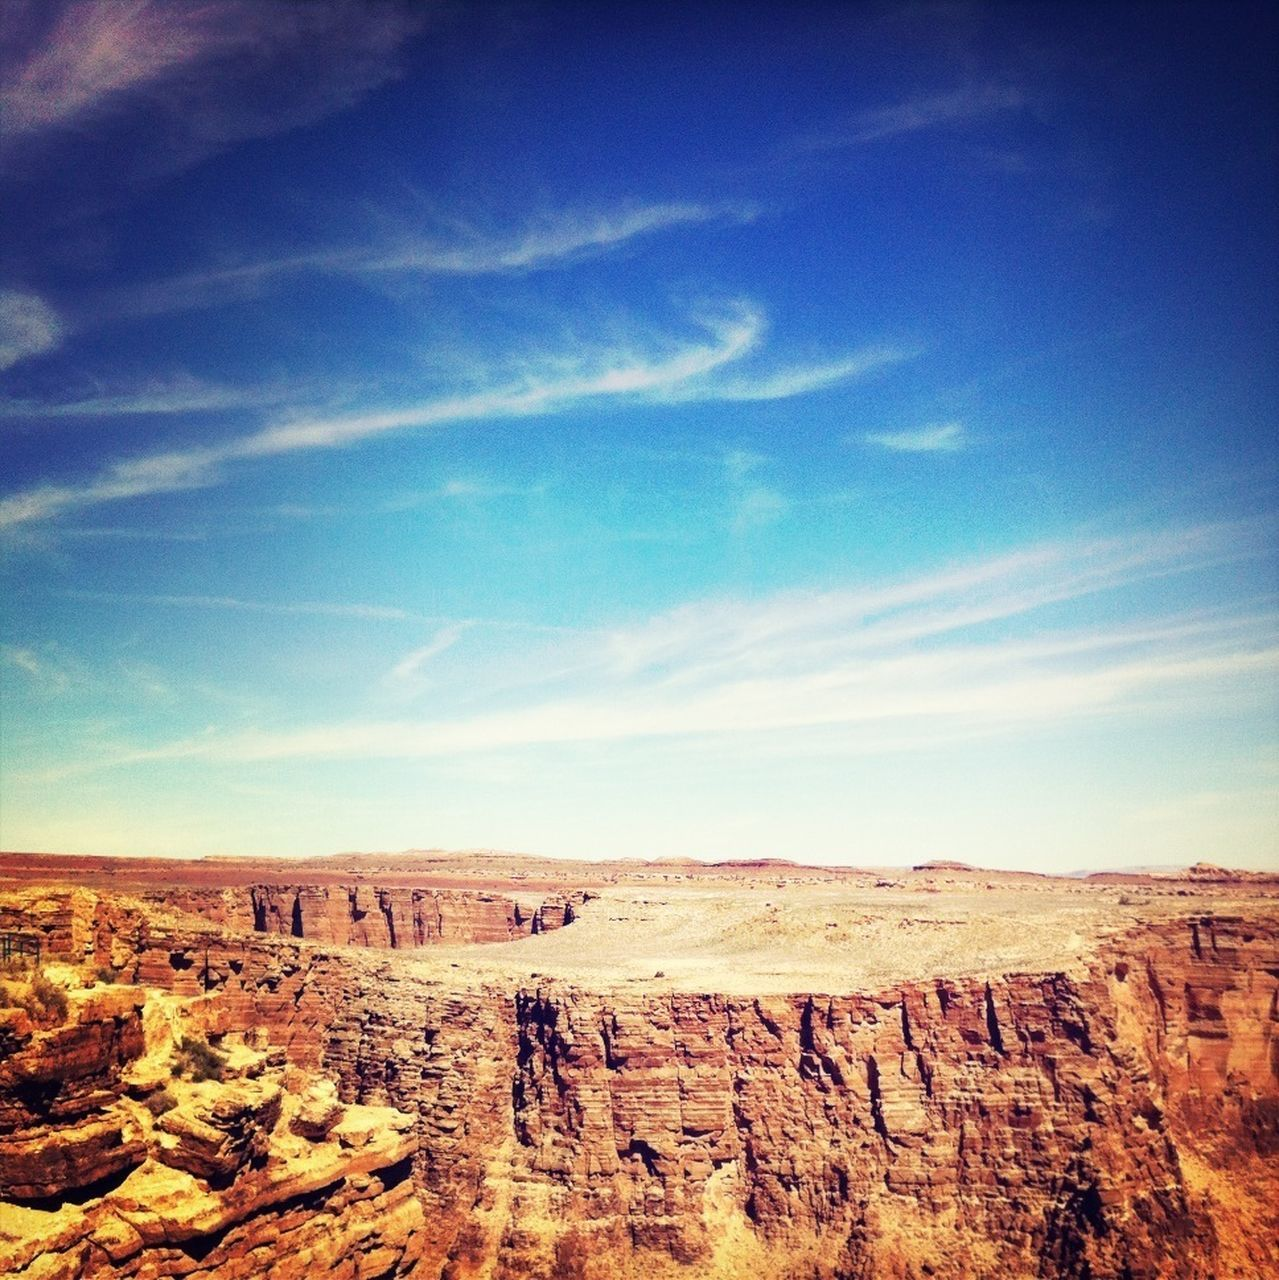 Rock formations against blue sky on landscape